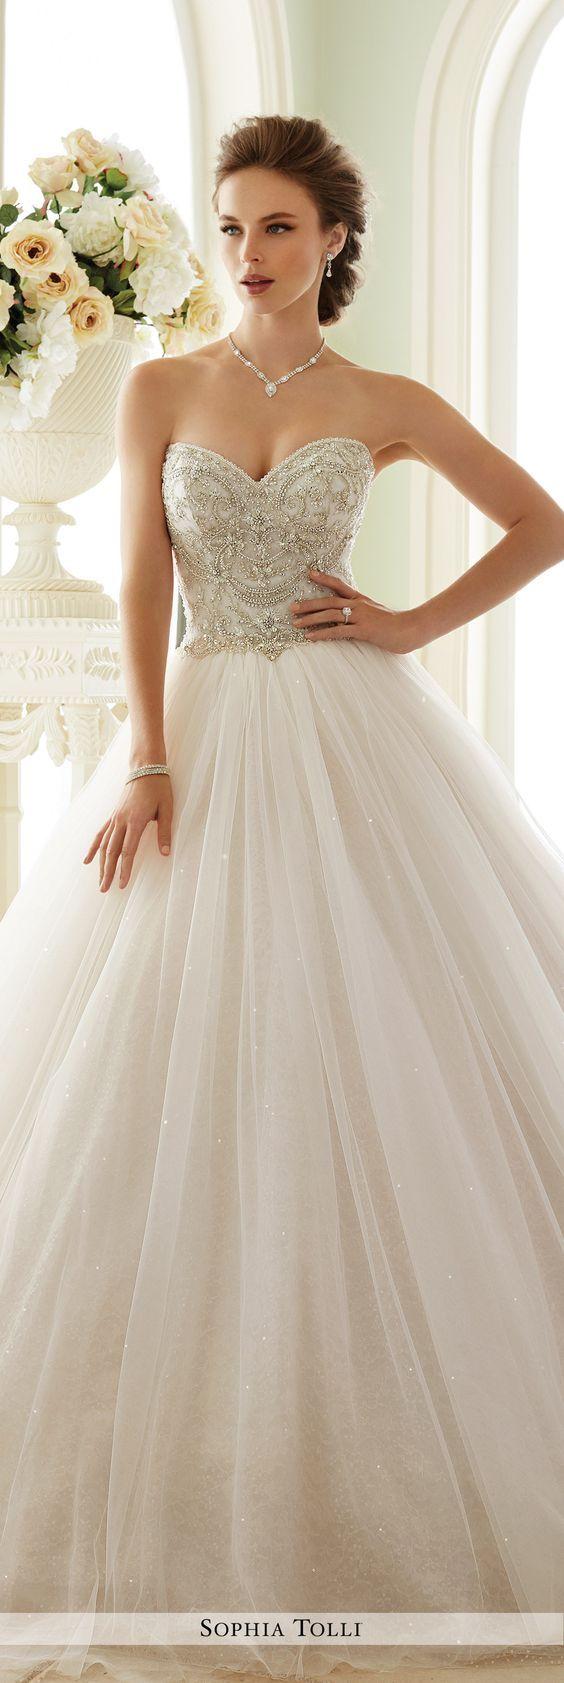 best someday images on pinterest wedding bridesmaid dresses